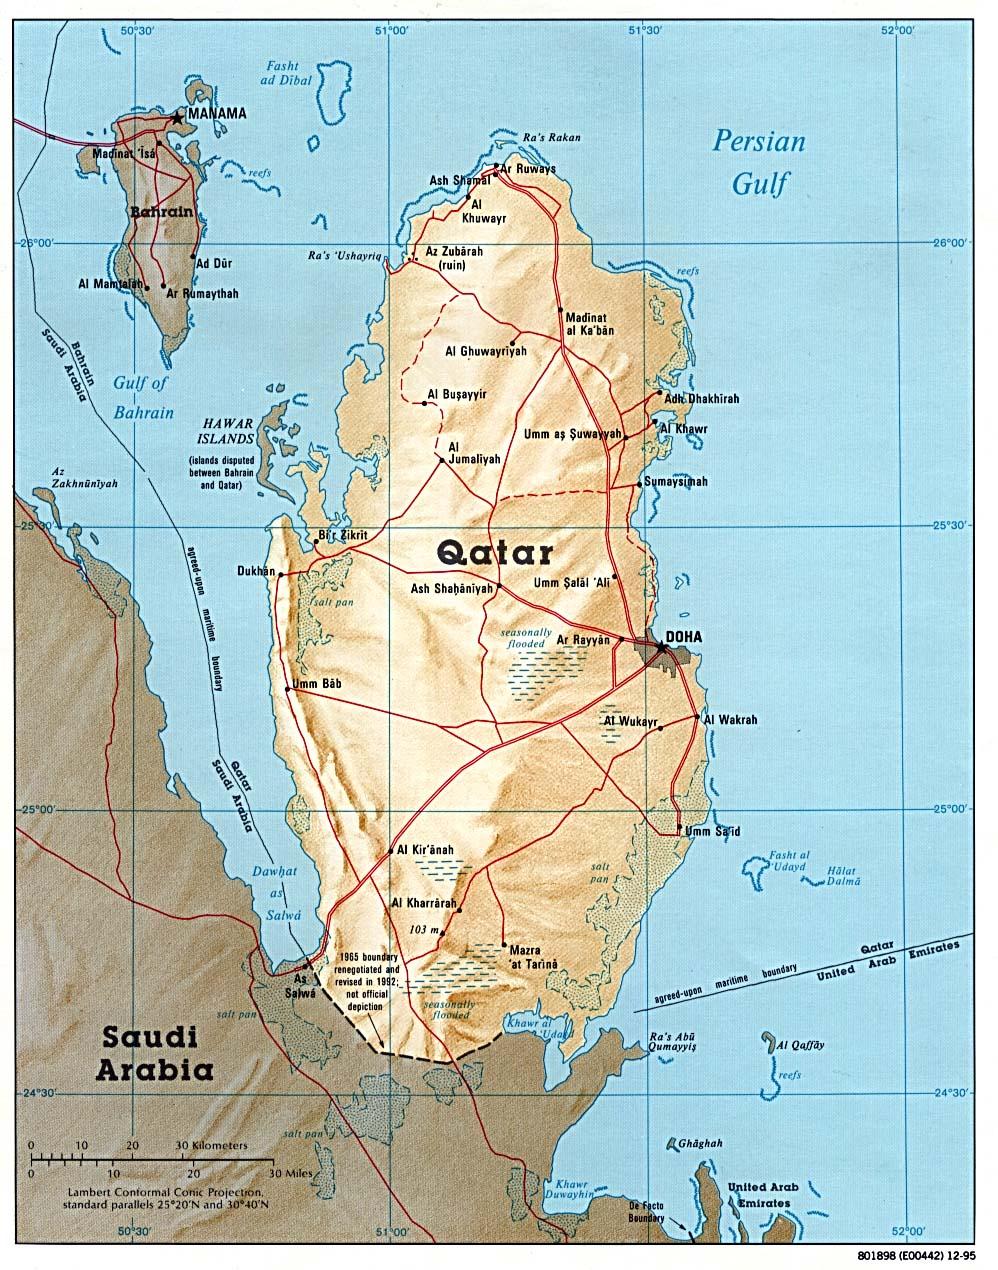 Map_Qatar_local.jpg